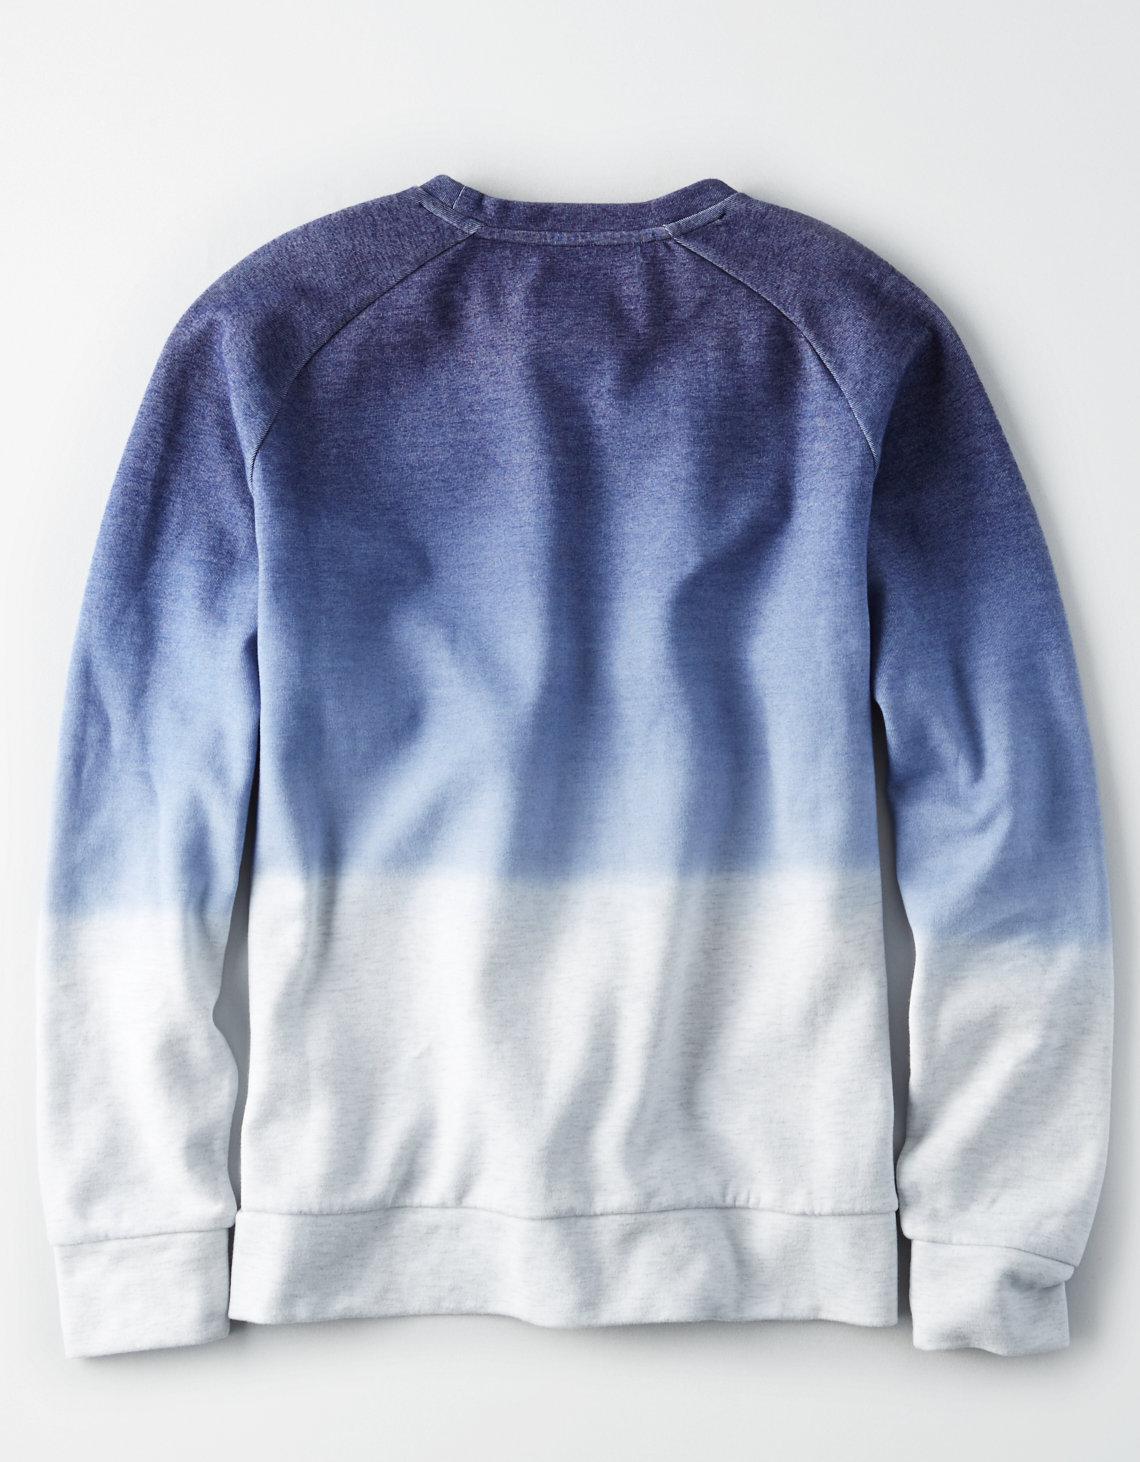 6f17659d American Eagle Ae Dip Dye Crew Neck Sweatshirt in Blue for Men - Lyst